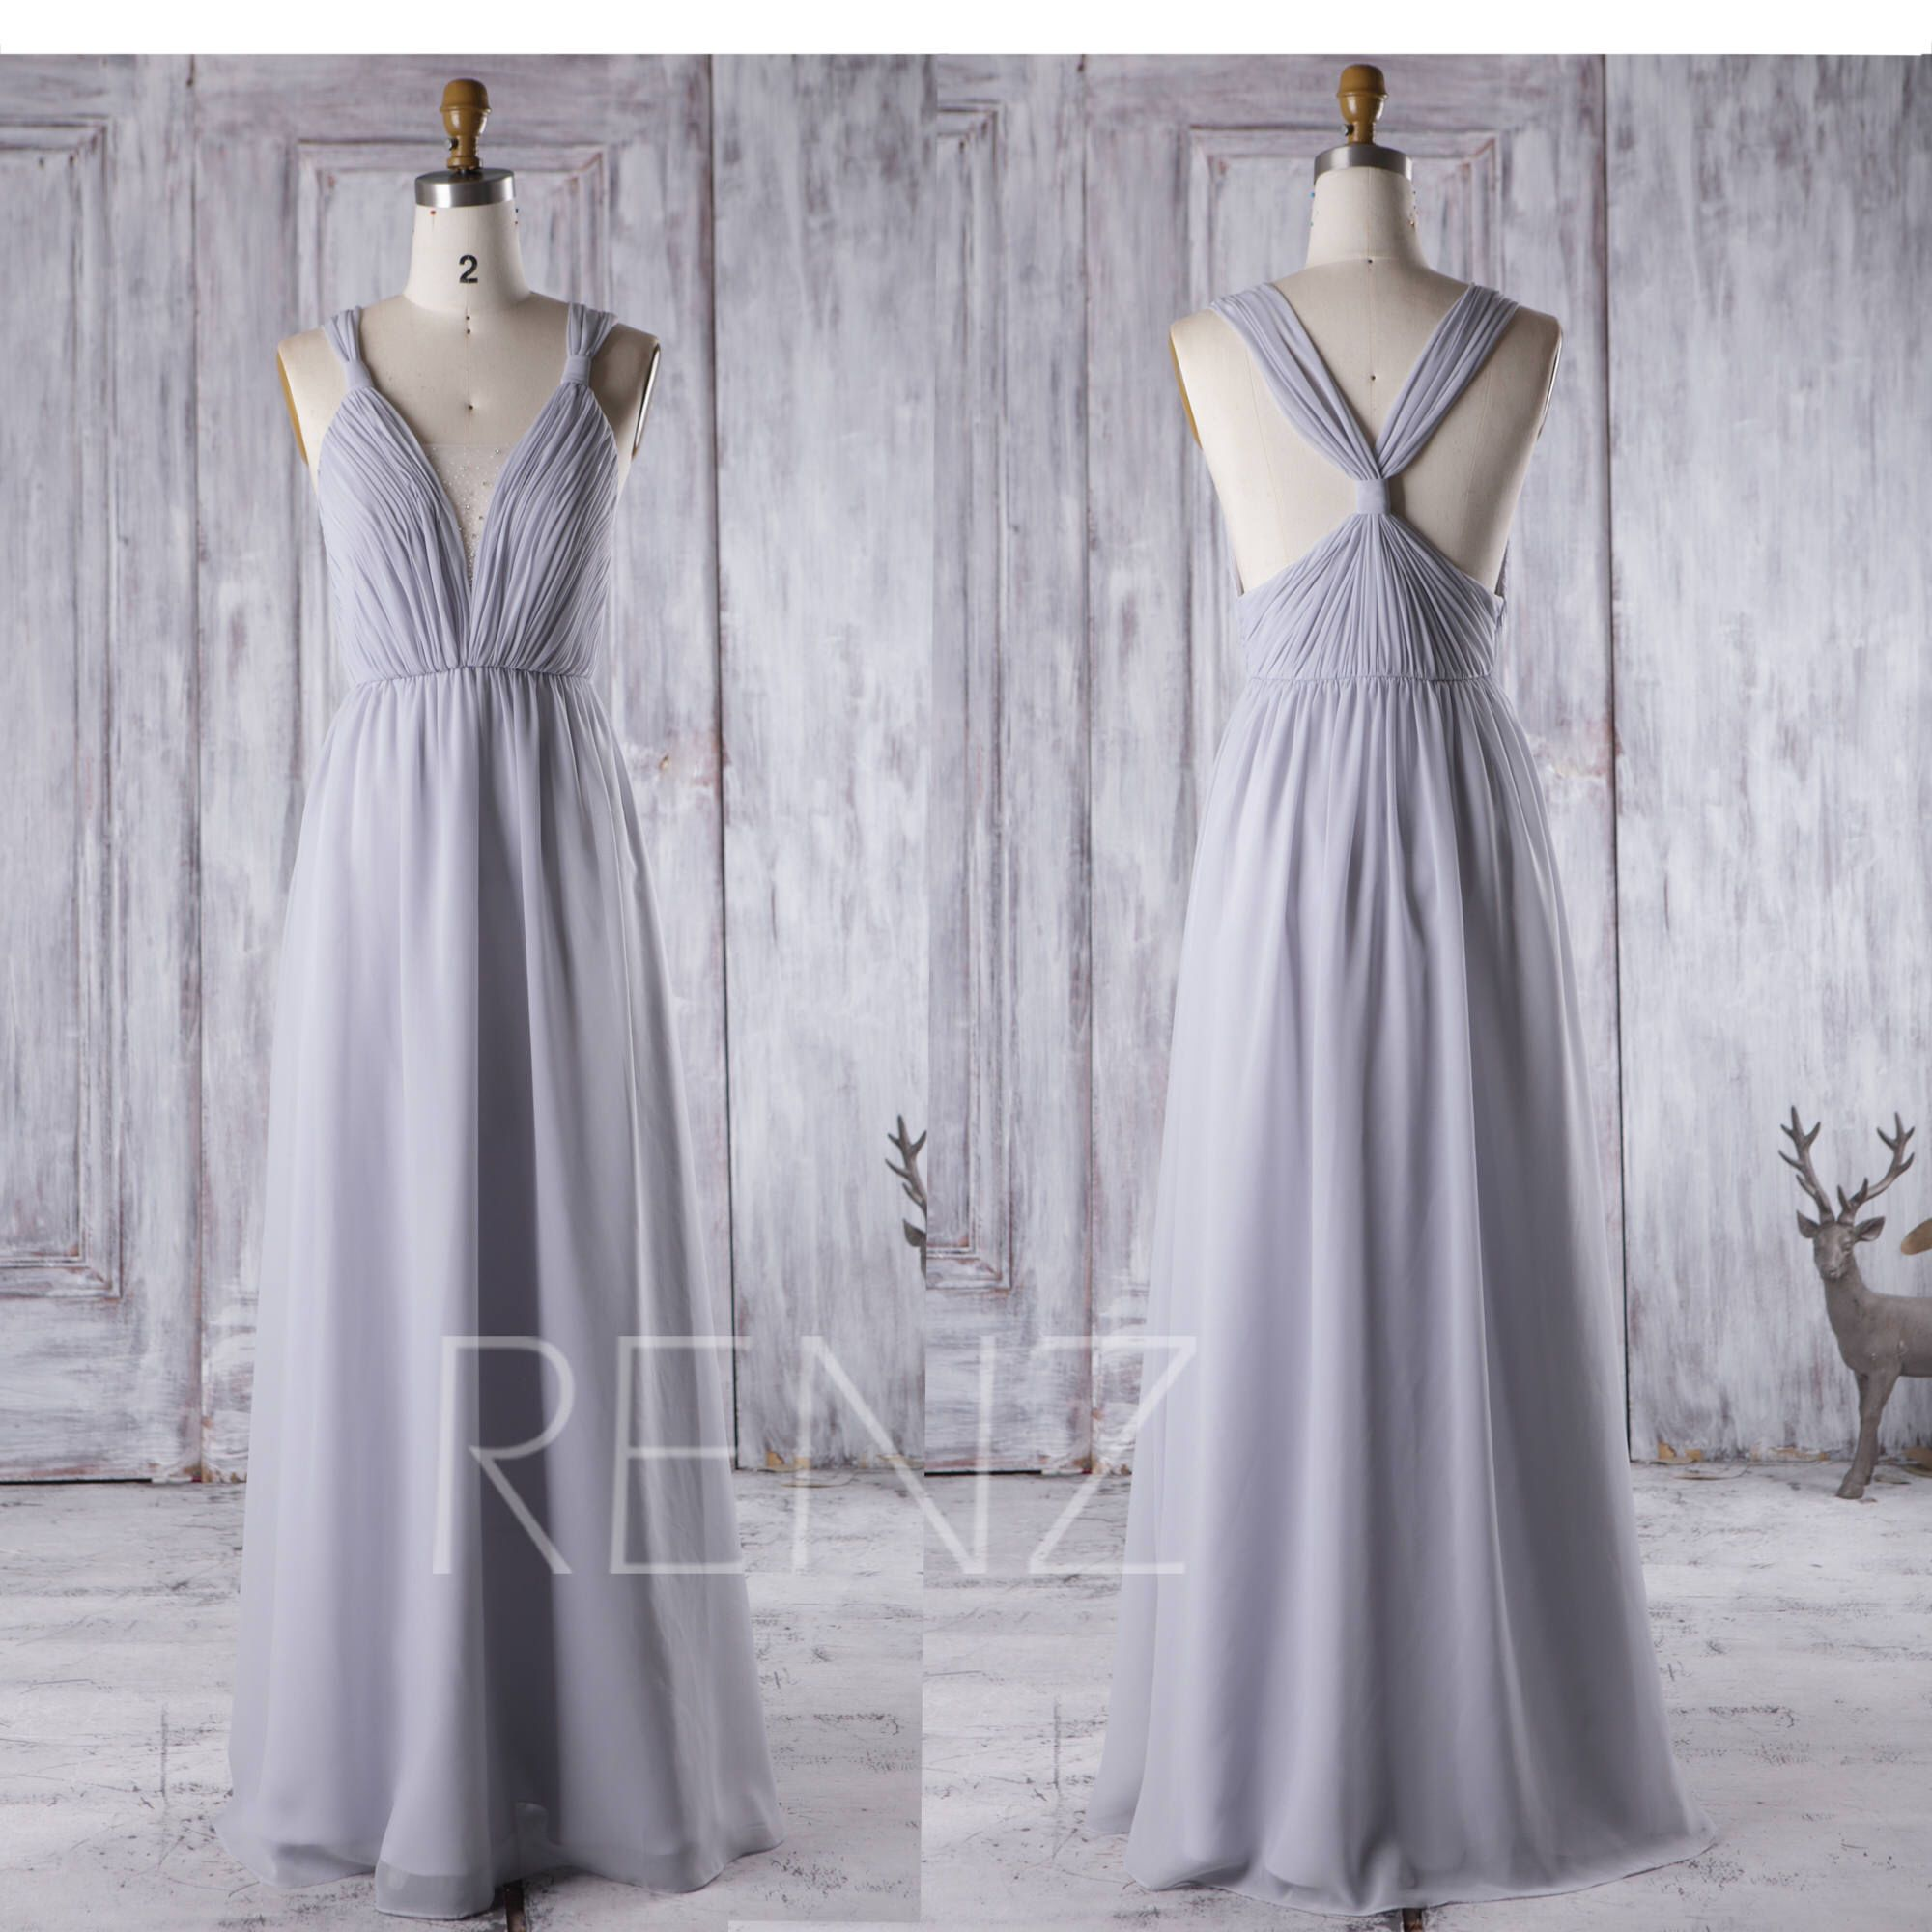 Bridesmaid Dress Light Gray Wedding Dress Beaded,Deep V Neck Ball ...